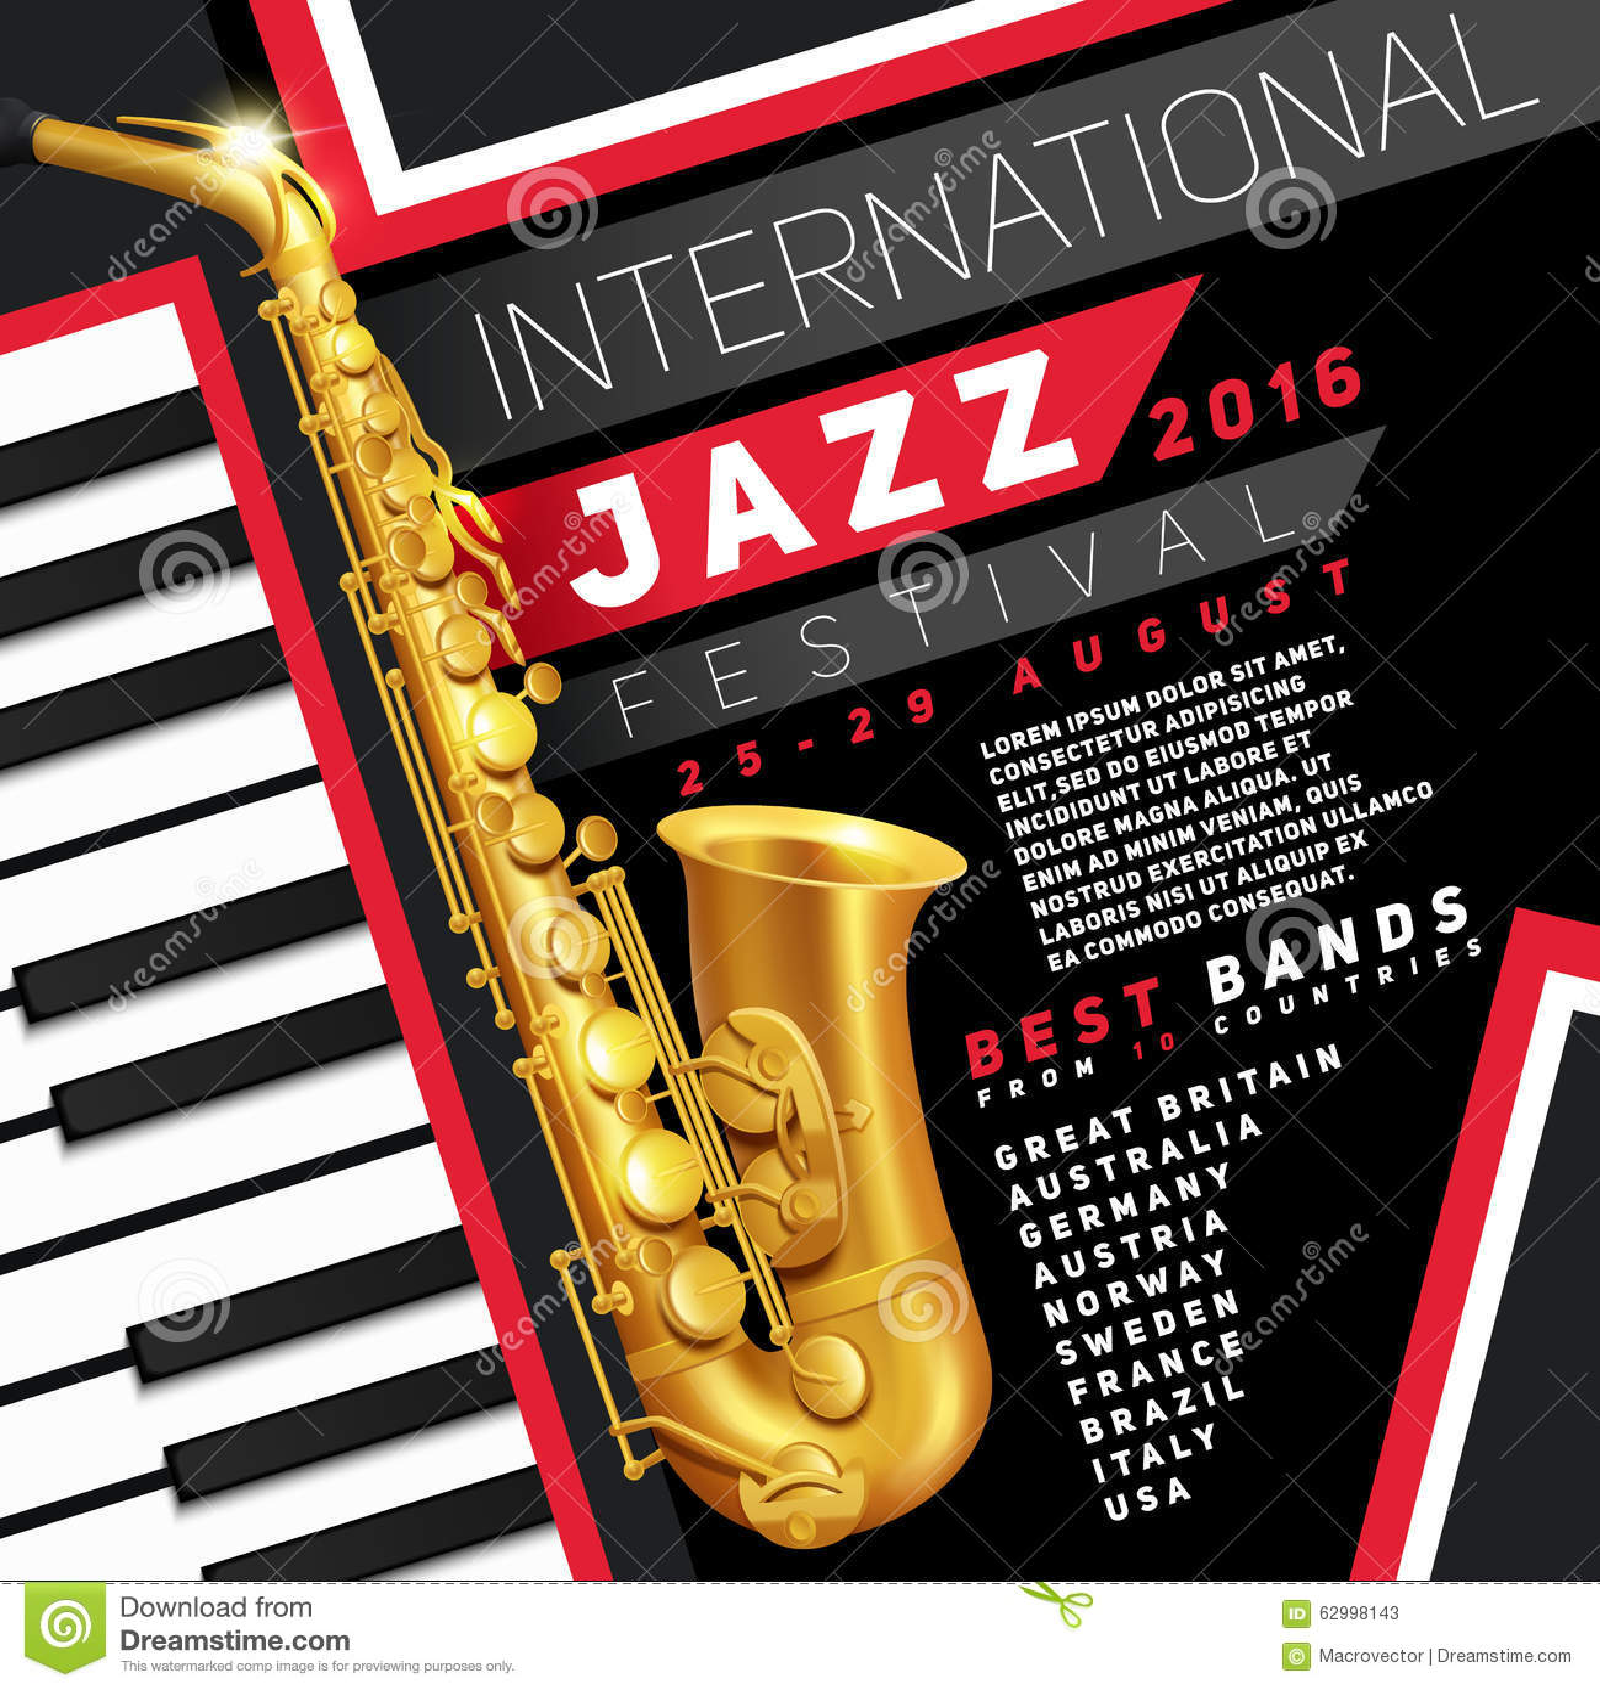 jazz festival poster stock illustration  image of decorative